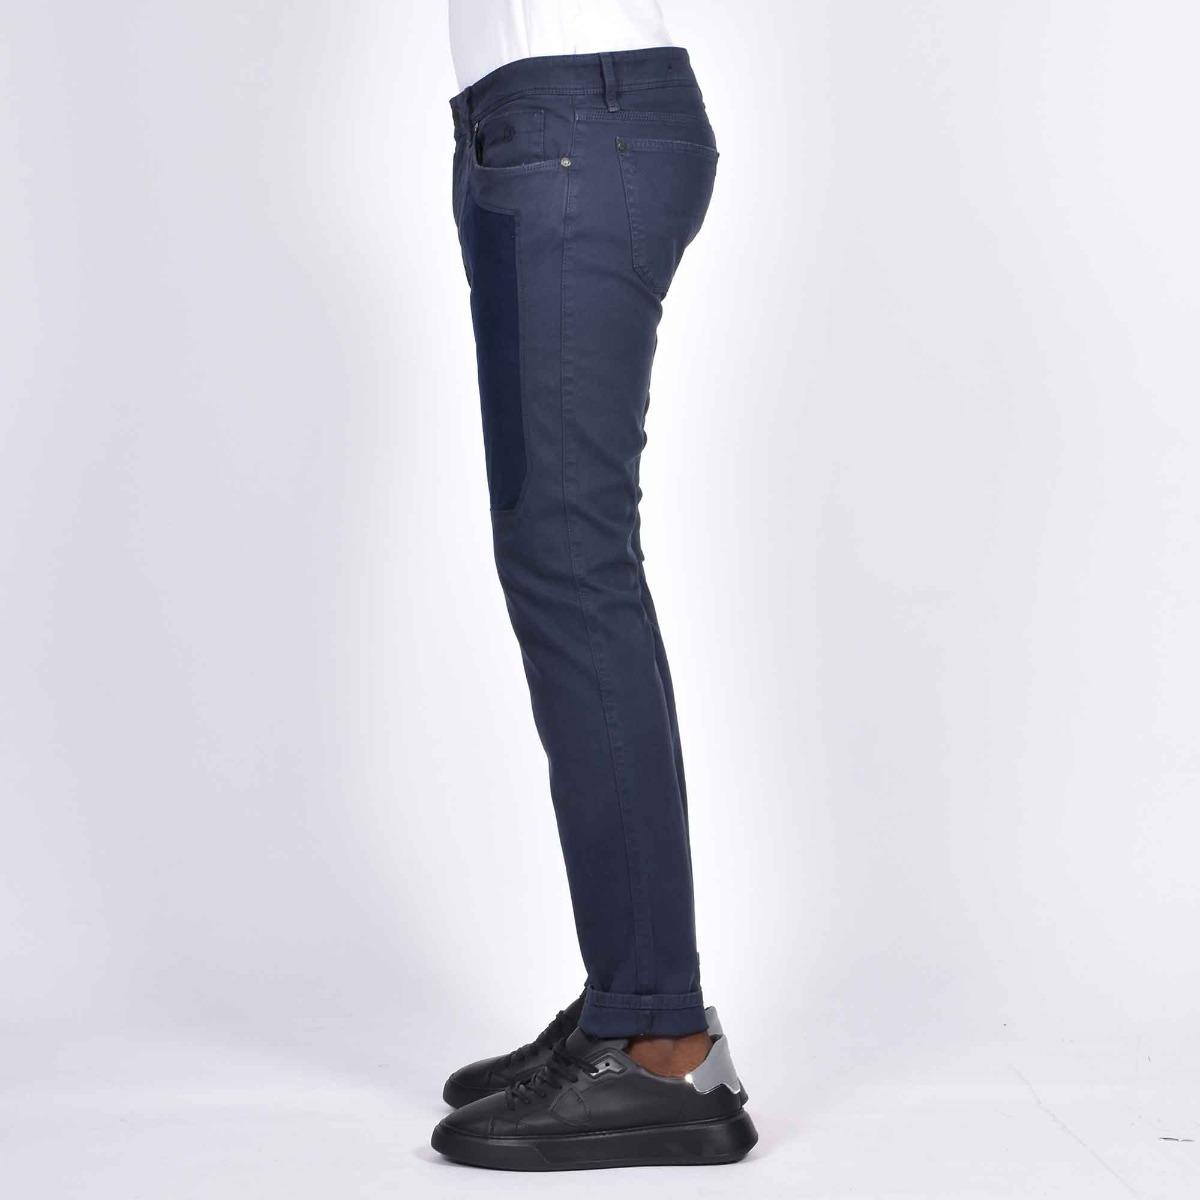 Pantalone 5 tasche e toppe - Blu